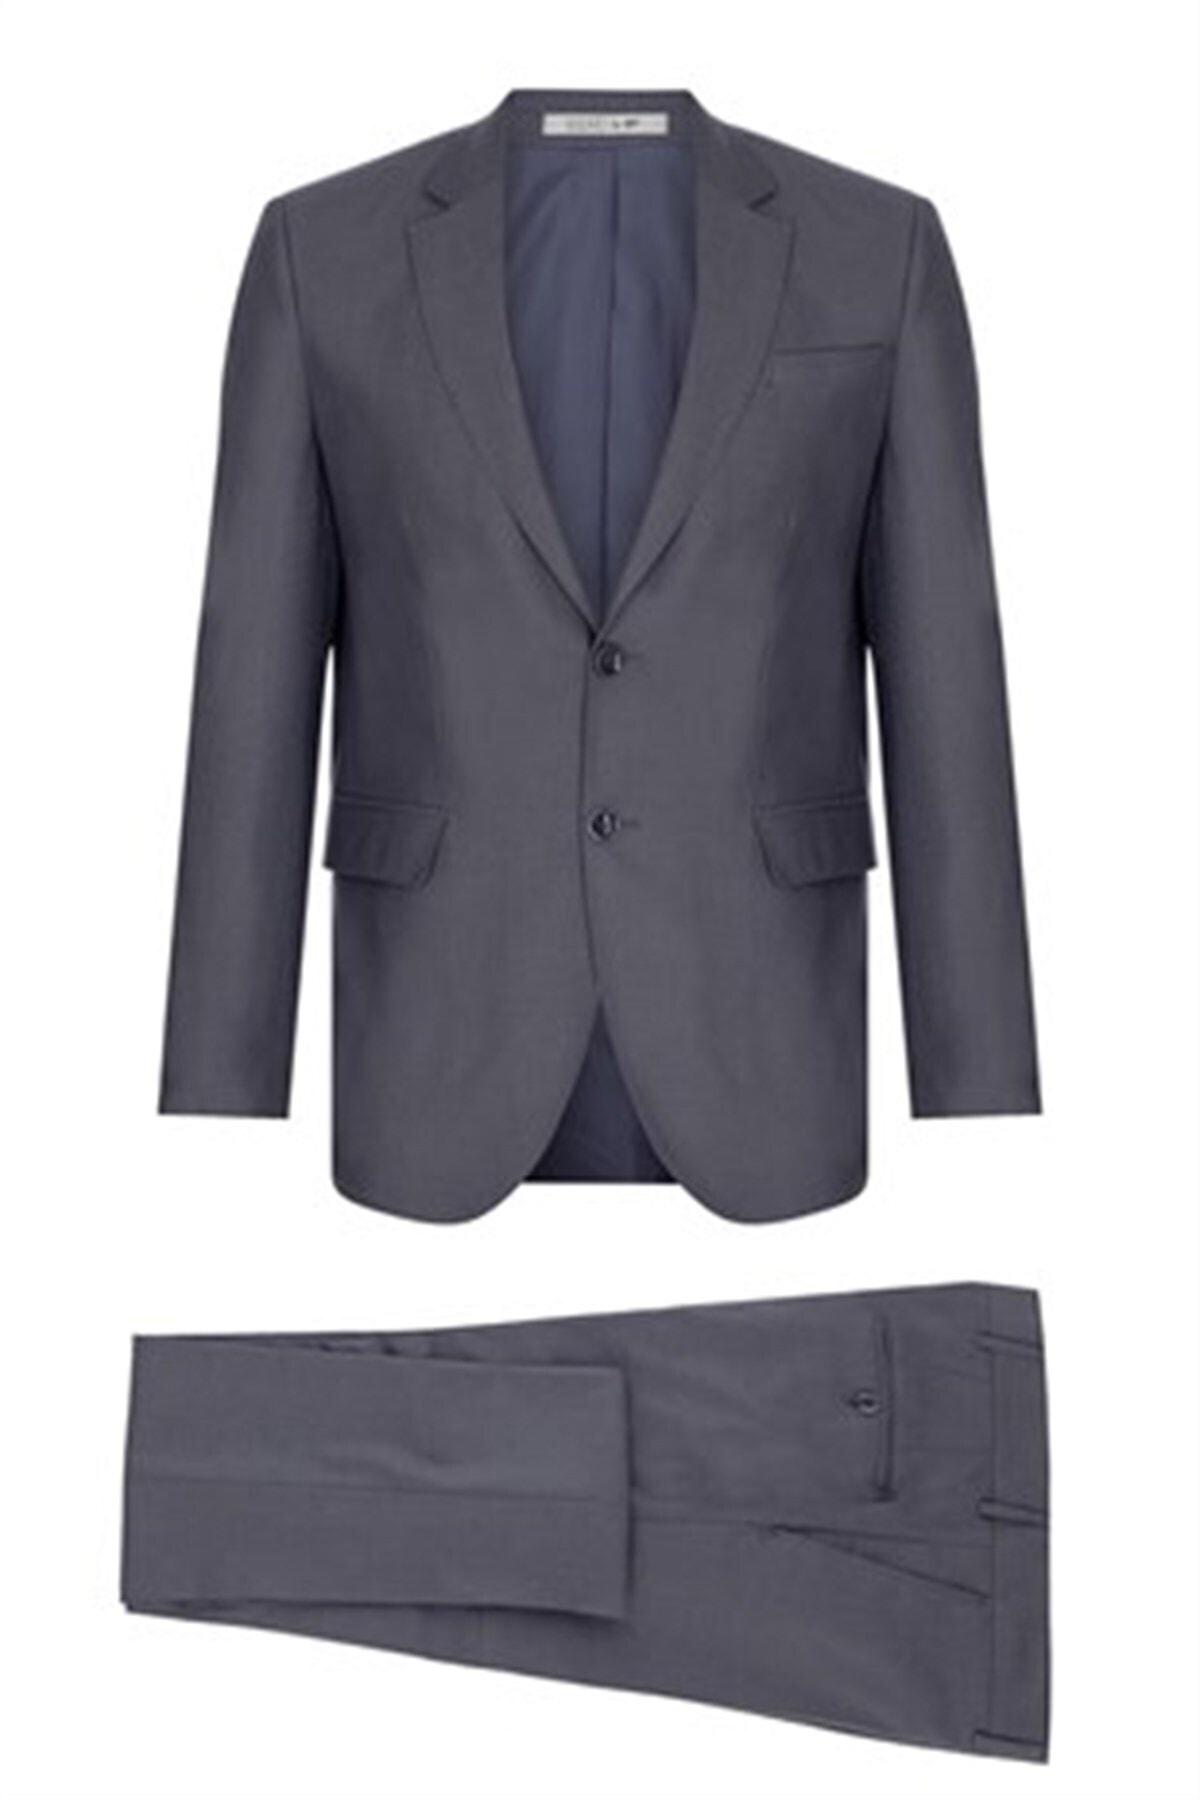 İgs Erkek Duman Regularfıt / Rahat Kalıp Std Takım Elbise 1